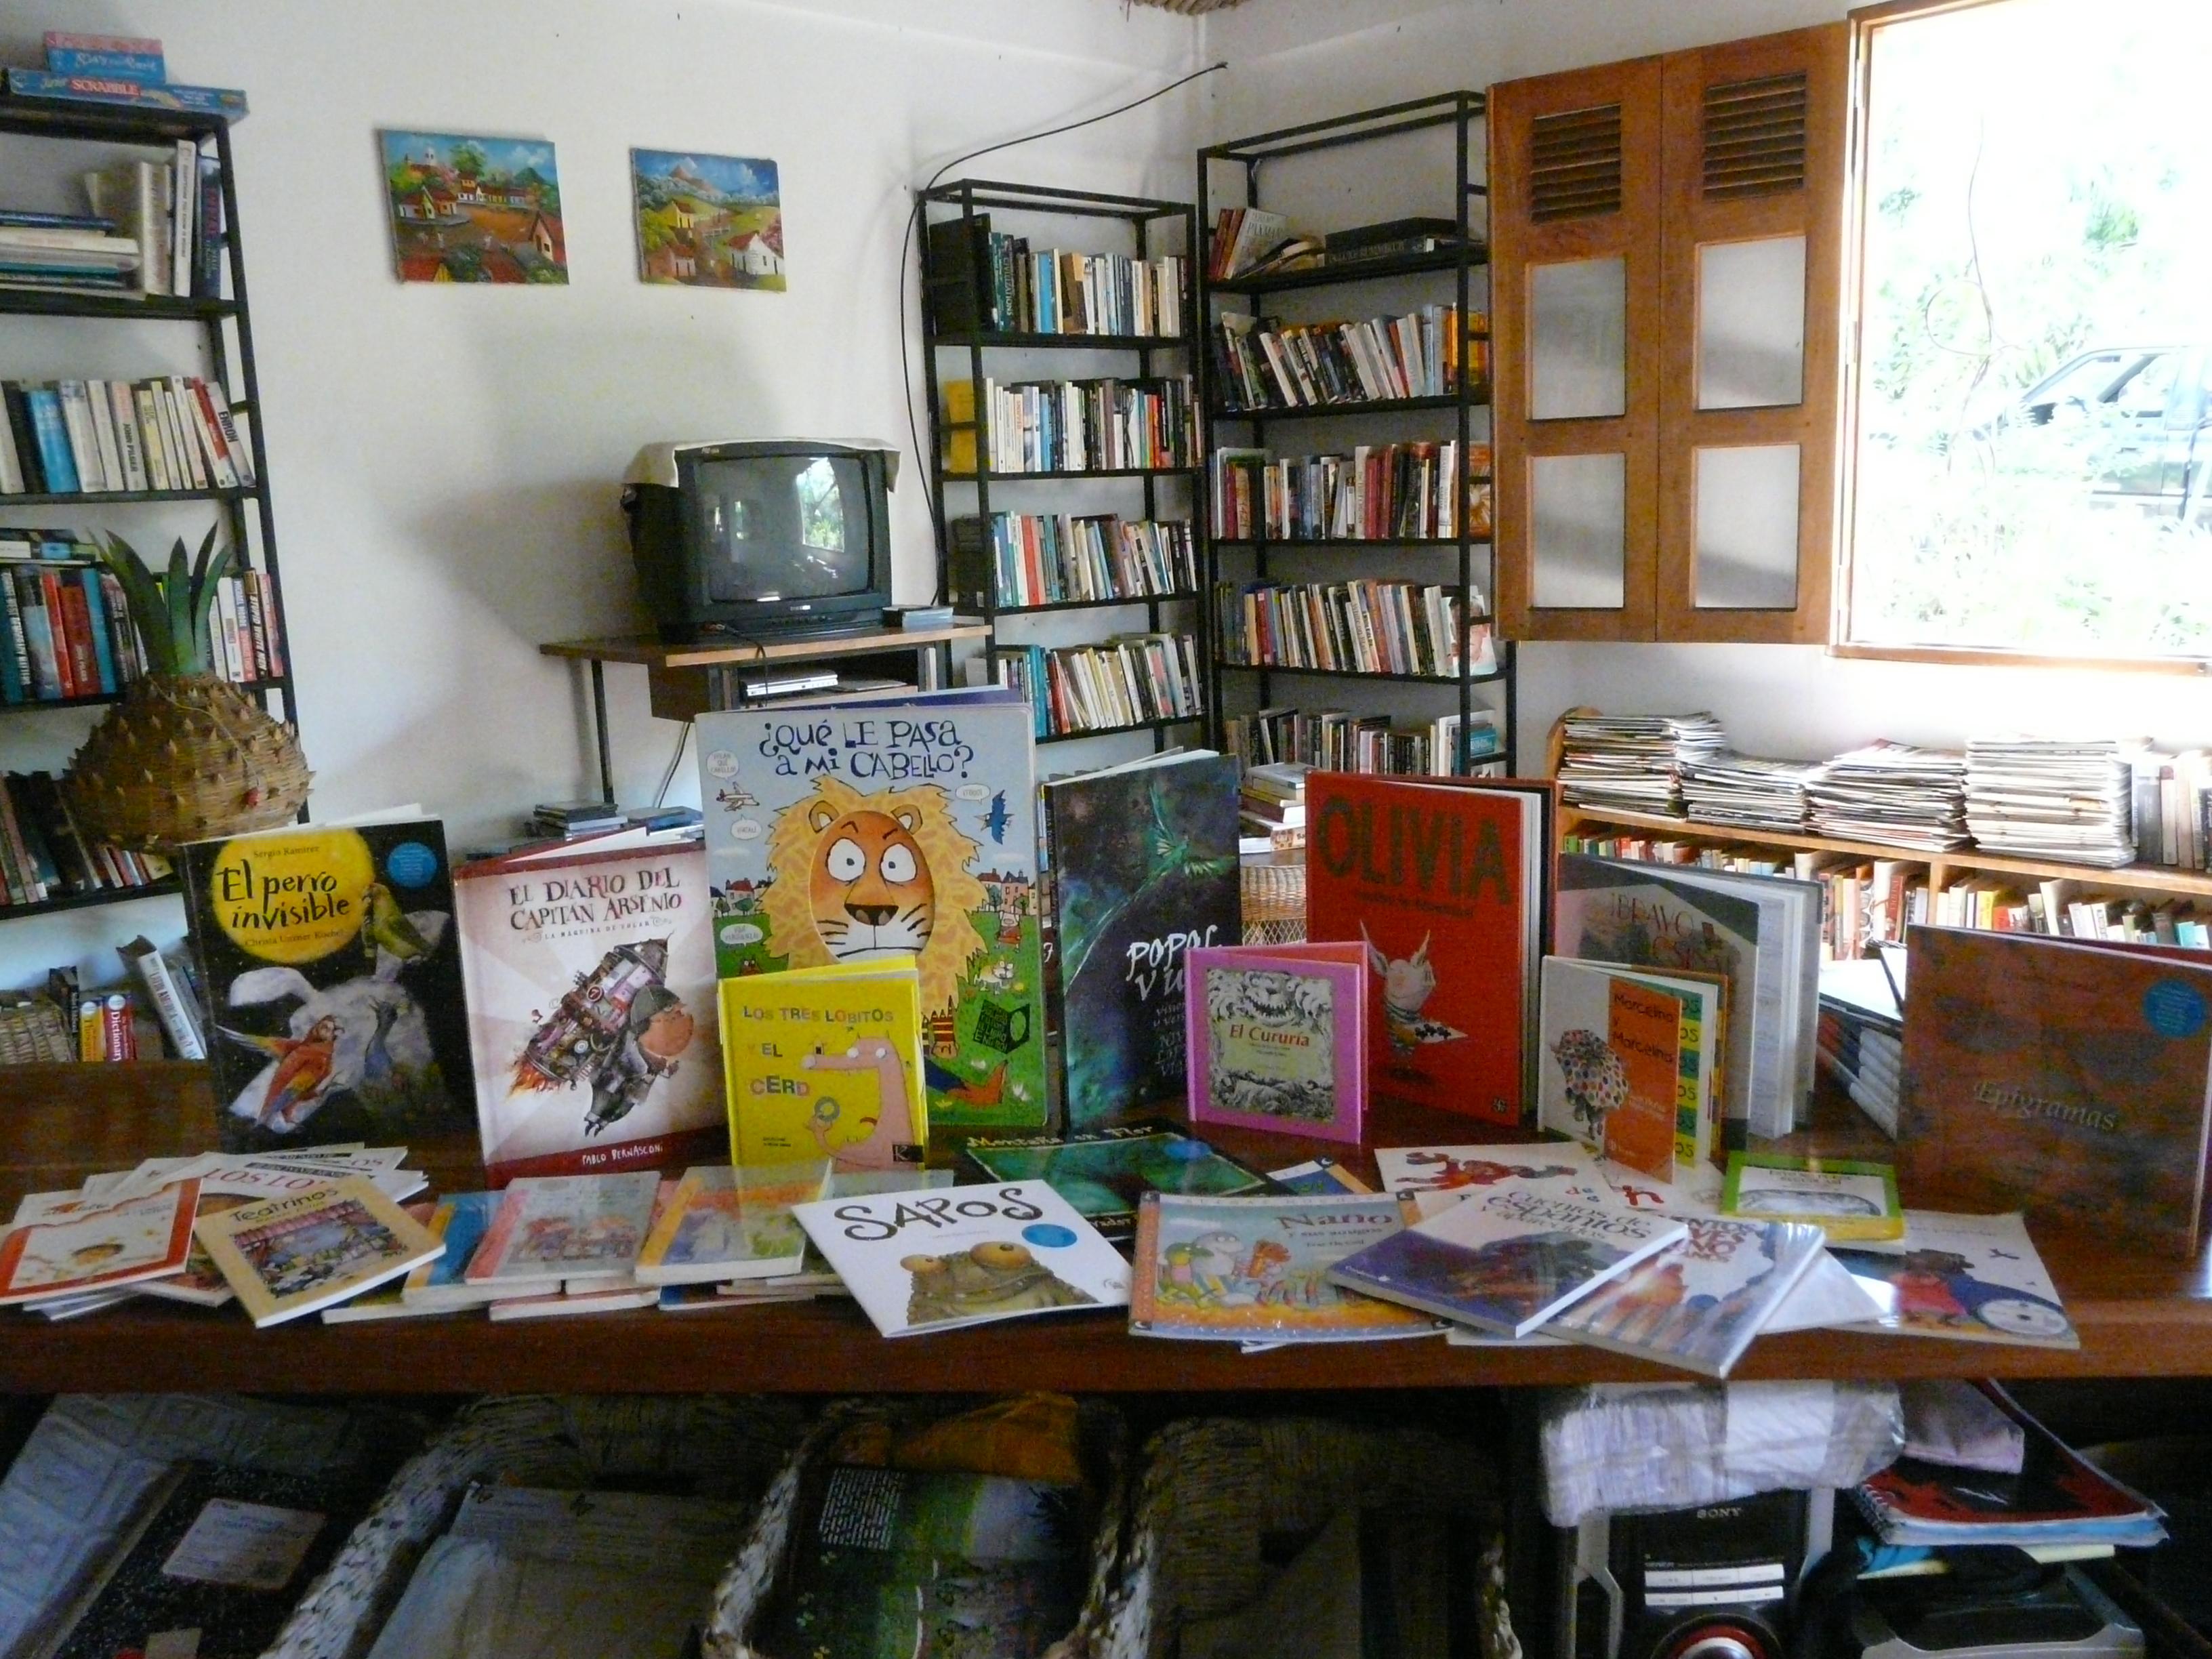 Spanish Story Books – La Mariposa